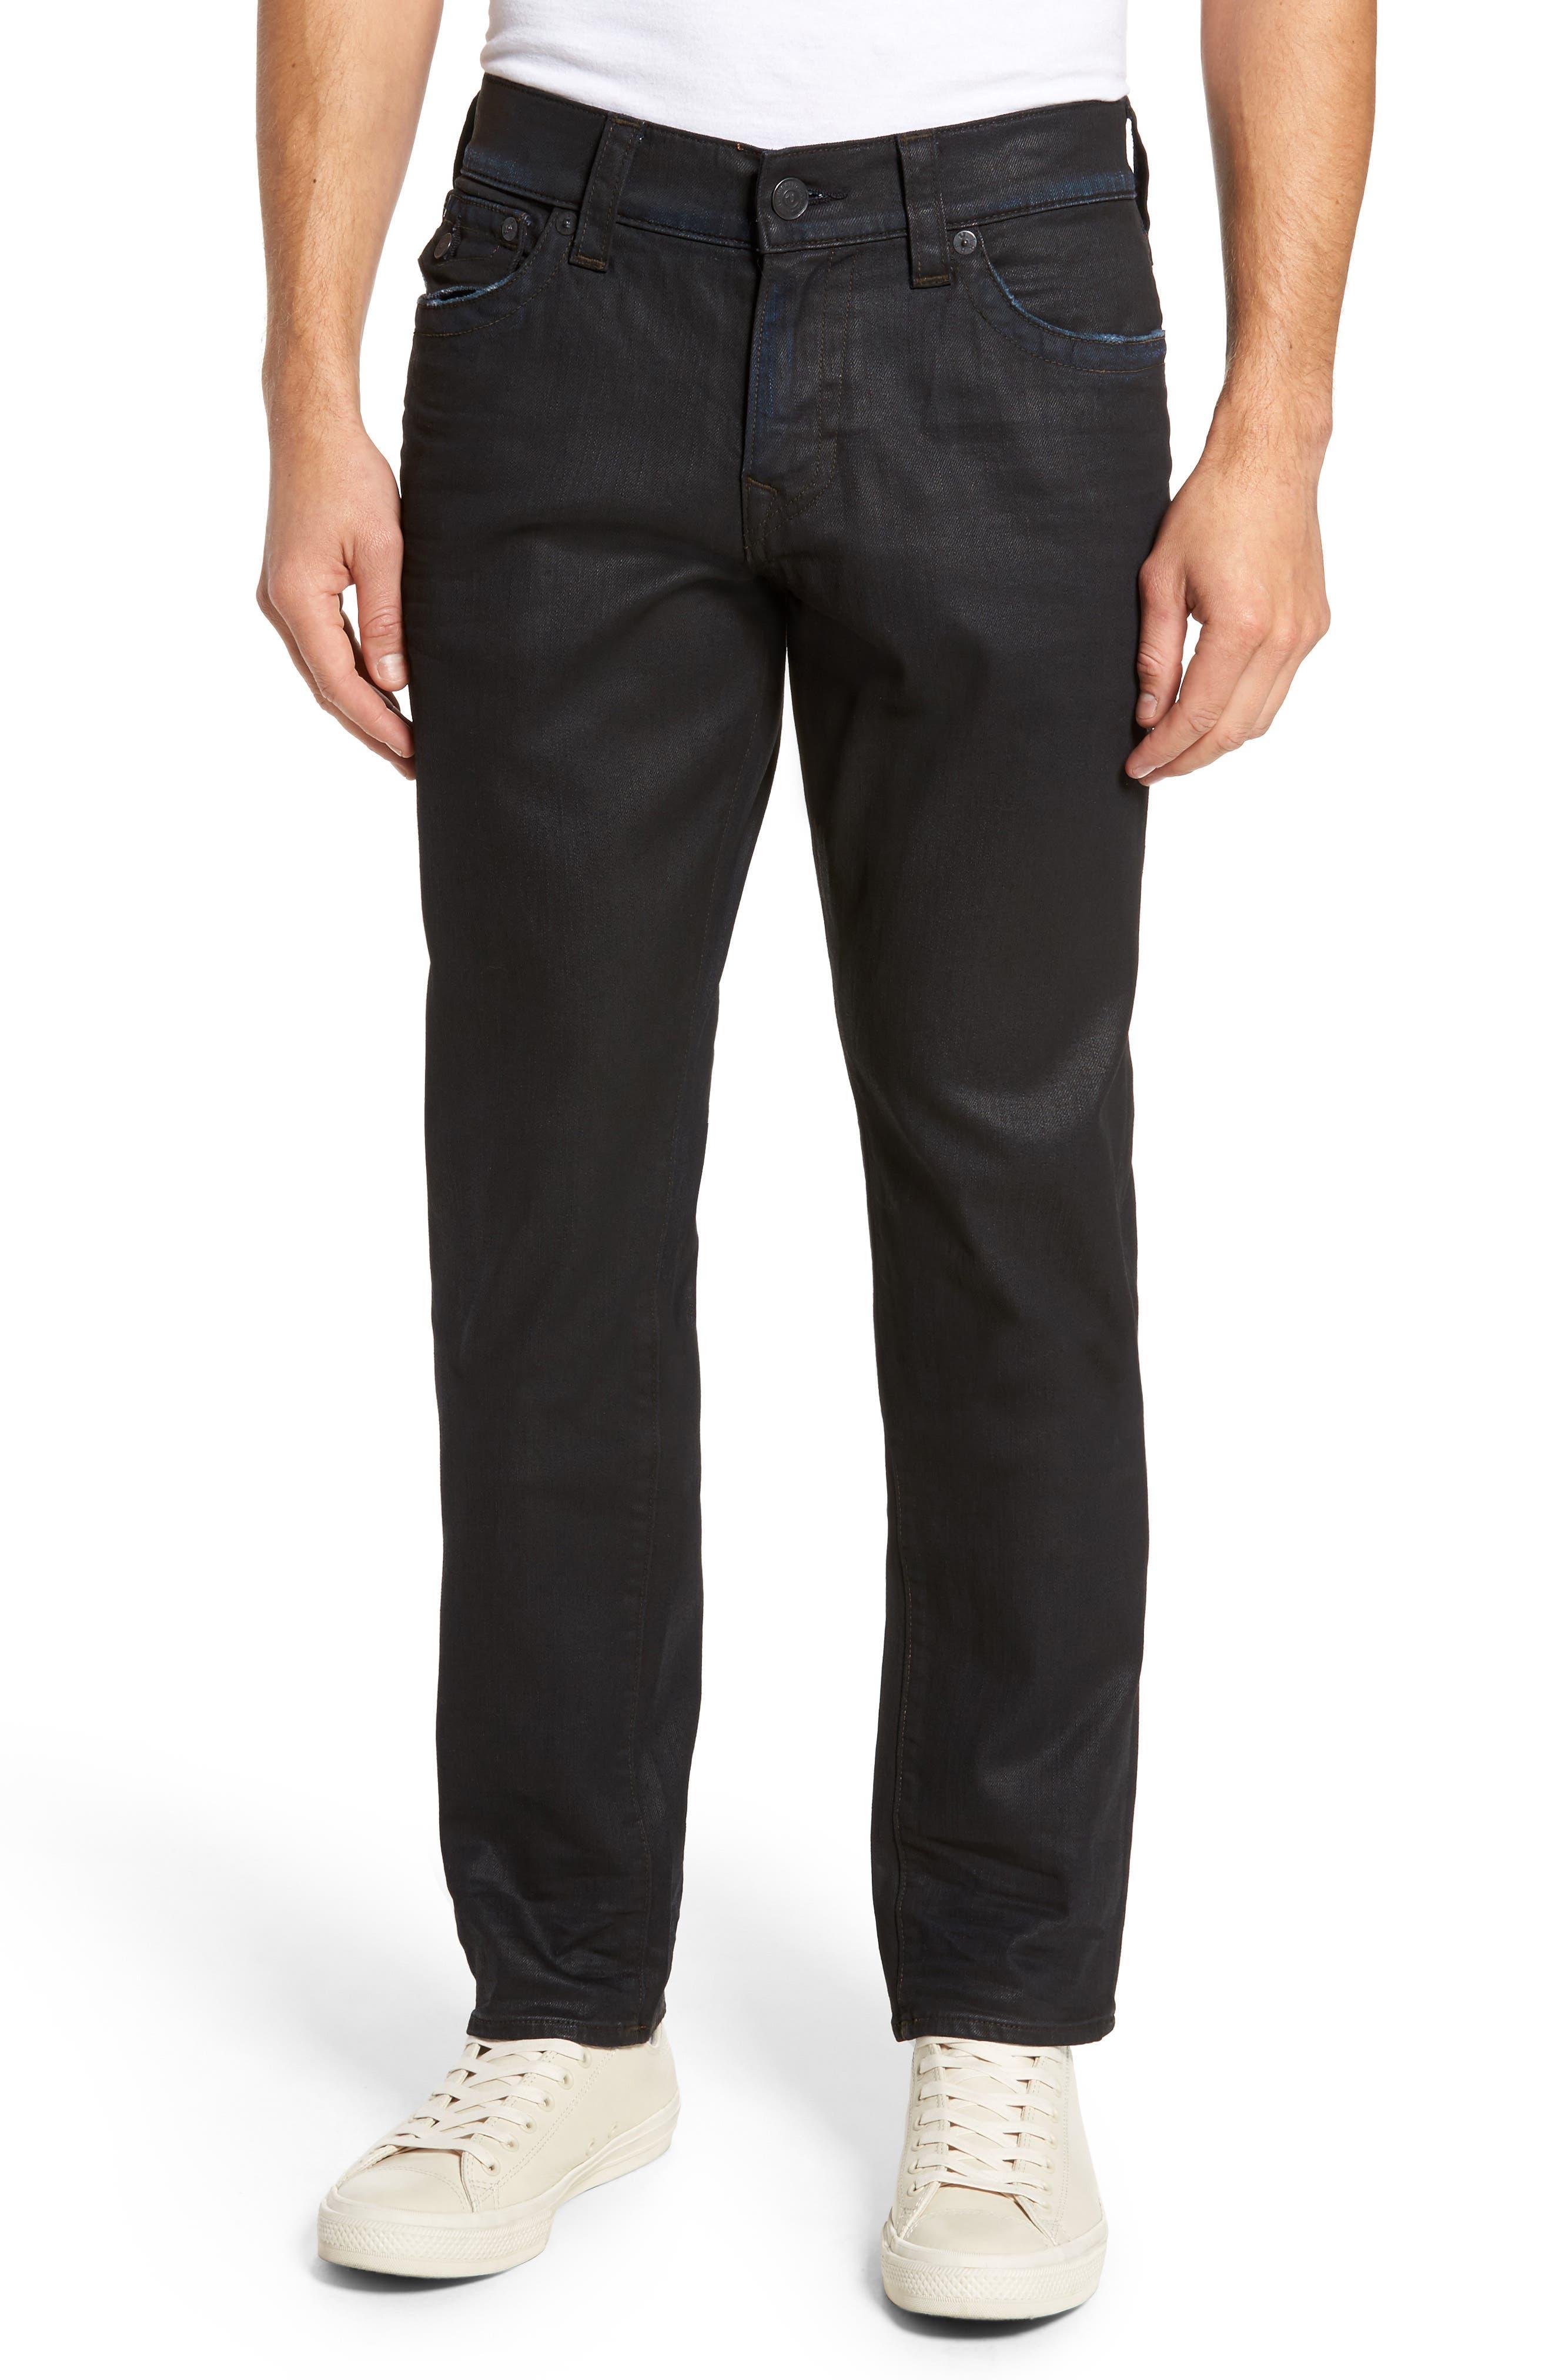 Main Image - True Religion Brand Jeans Geno Straight Leg Jeans (Dark Crater)